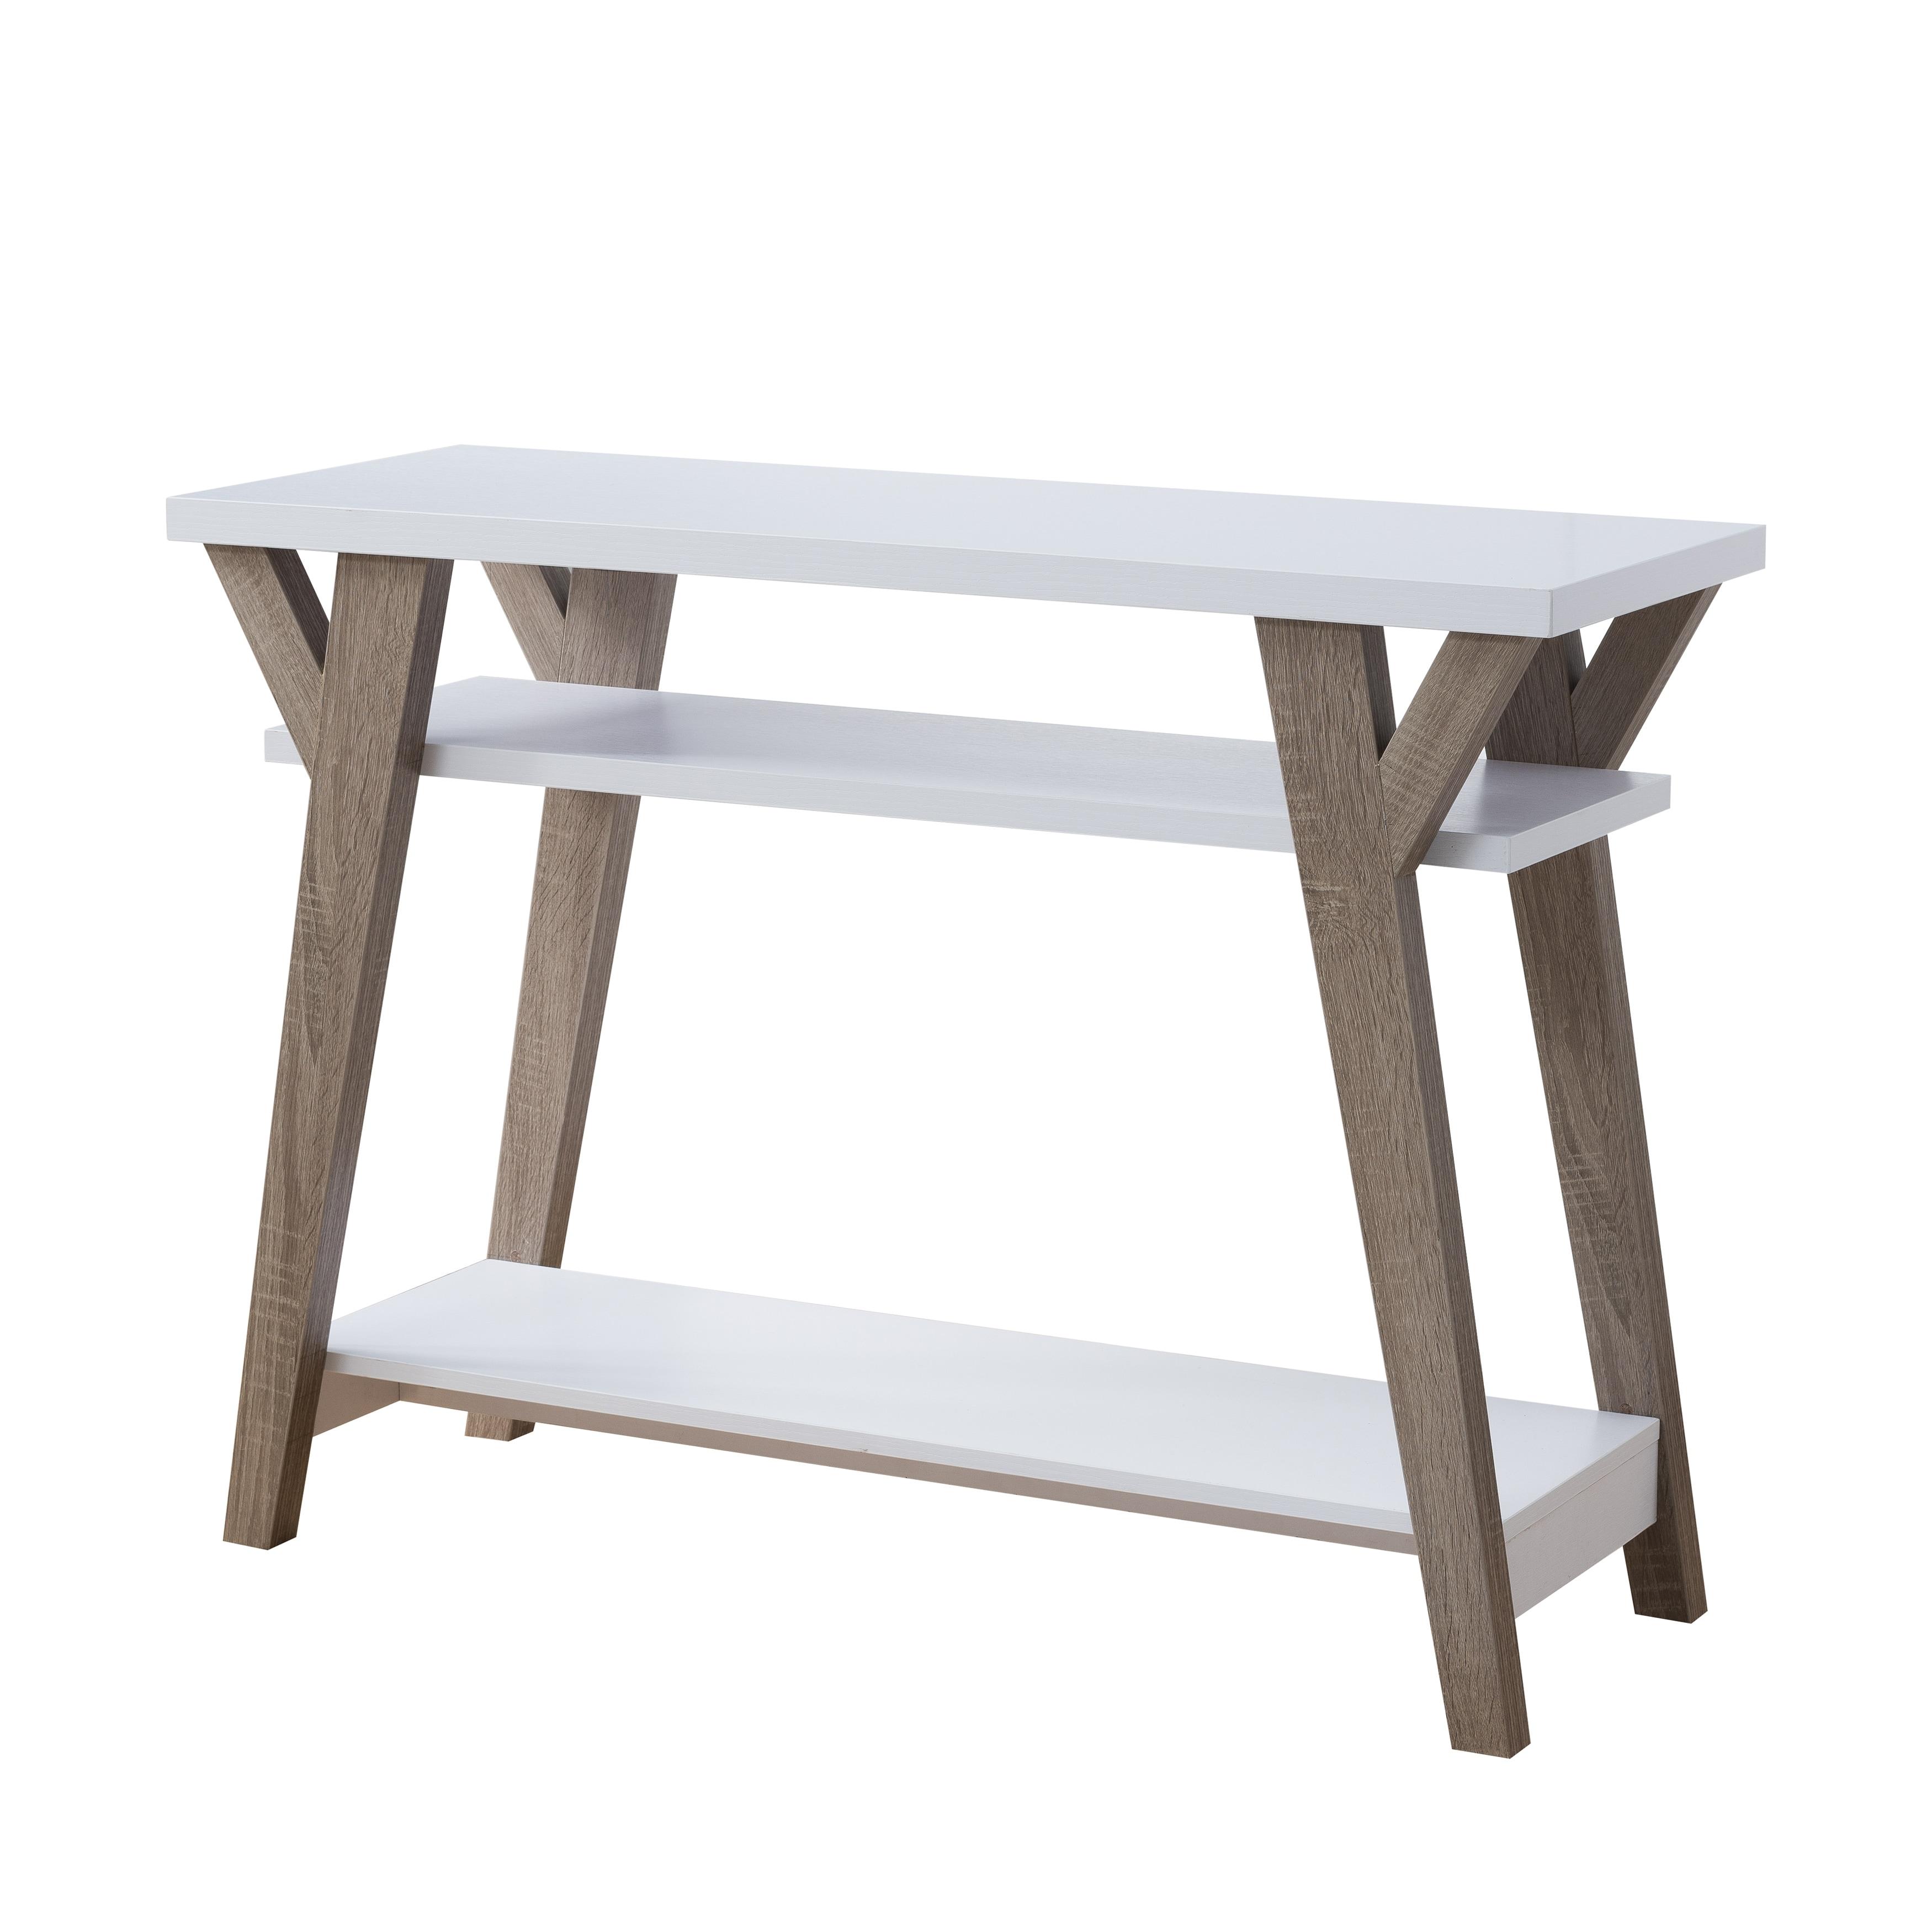 Furniture of America Shenera Contemporary White Distressed Oak